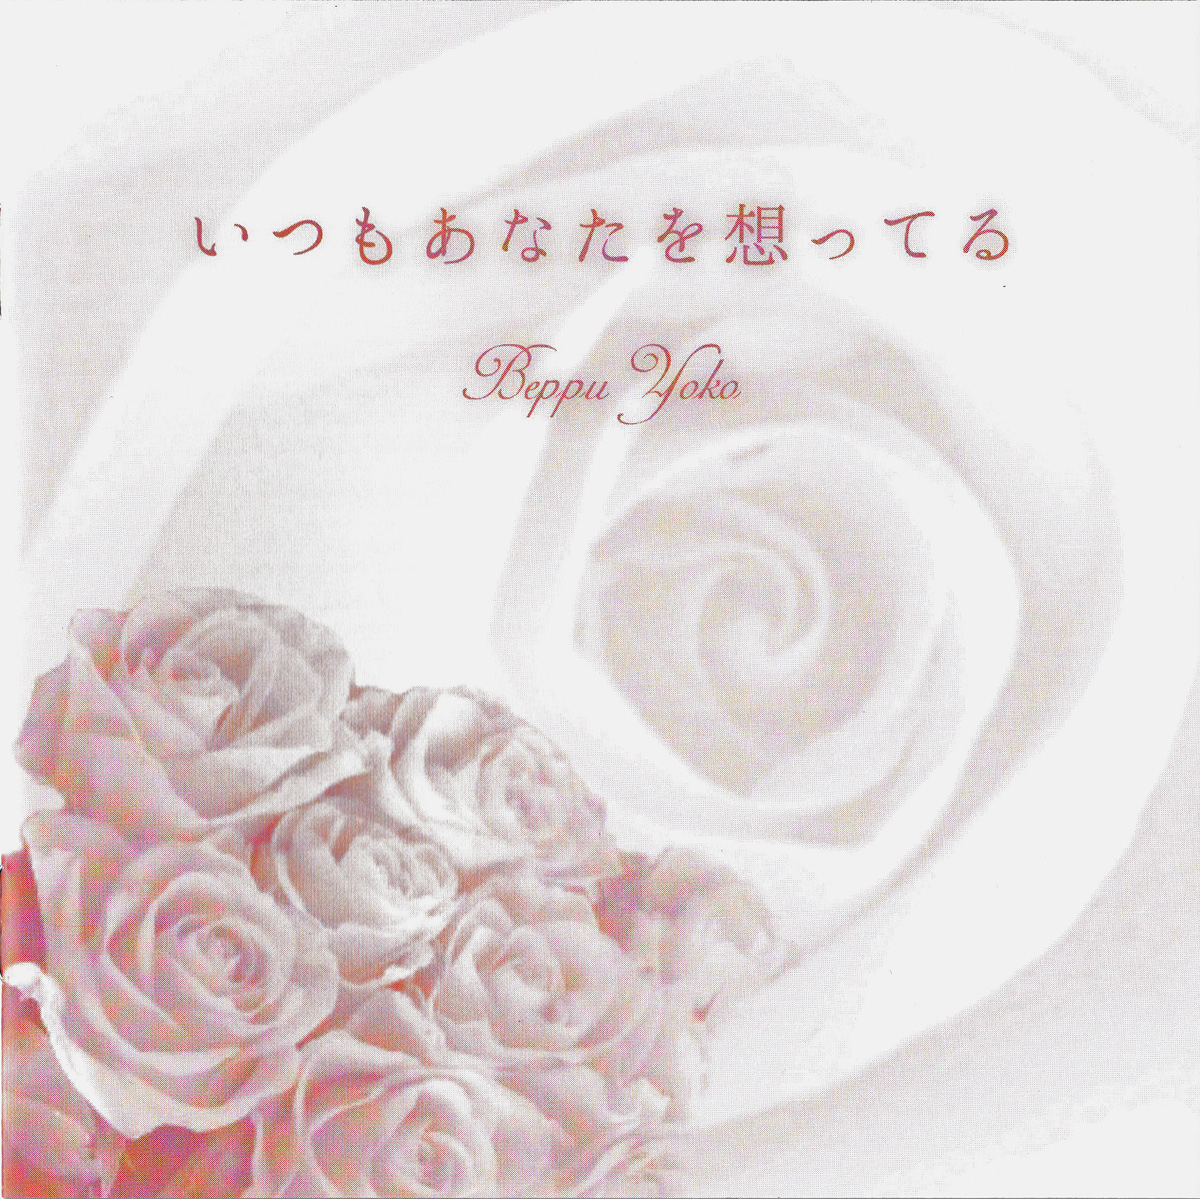 別府葉子公式ブログ ~葉子通信